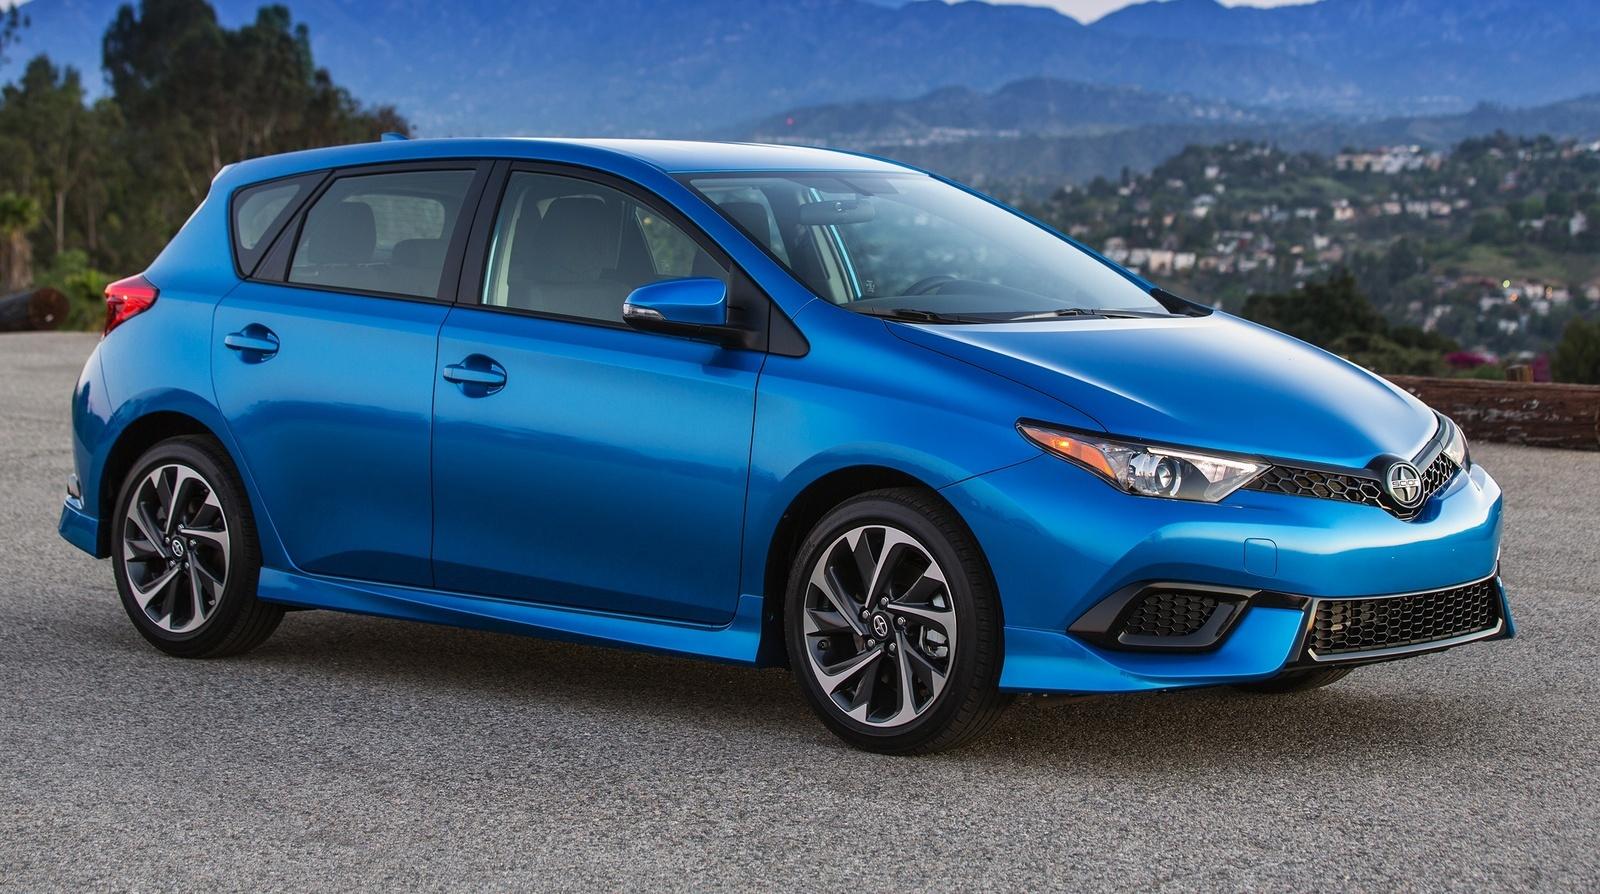 Nissan Lafayette La >> Subaru Of Baton Rouge New 2016 Subaru And Used Car | Autos Post